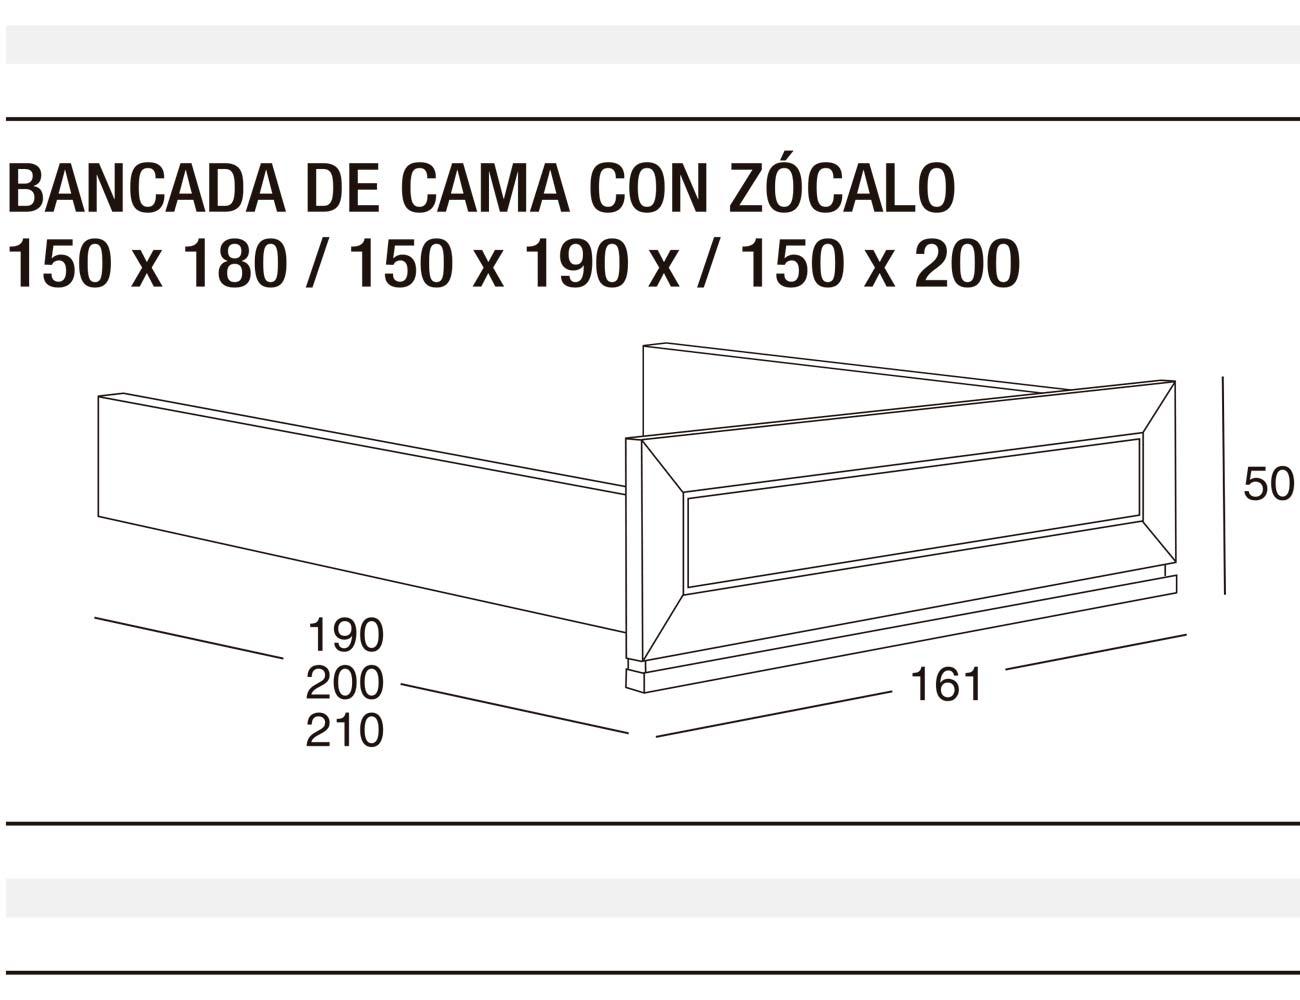 Bancada cama z 150x180 150x190 150x200